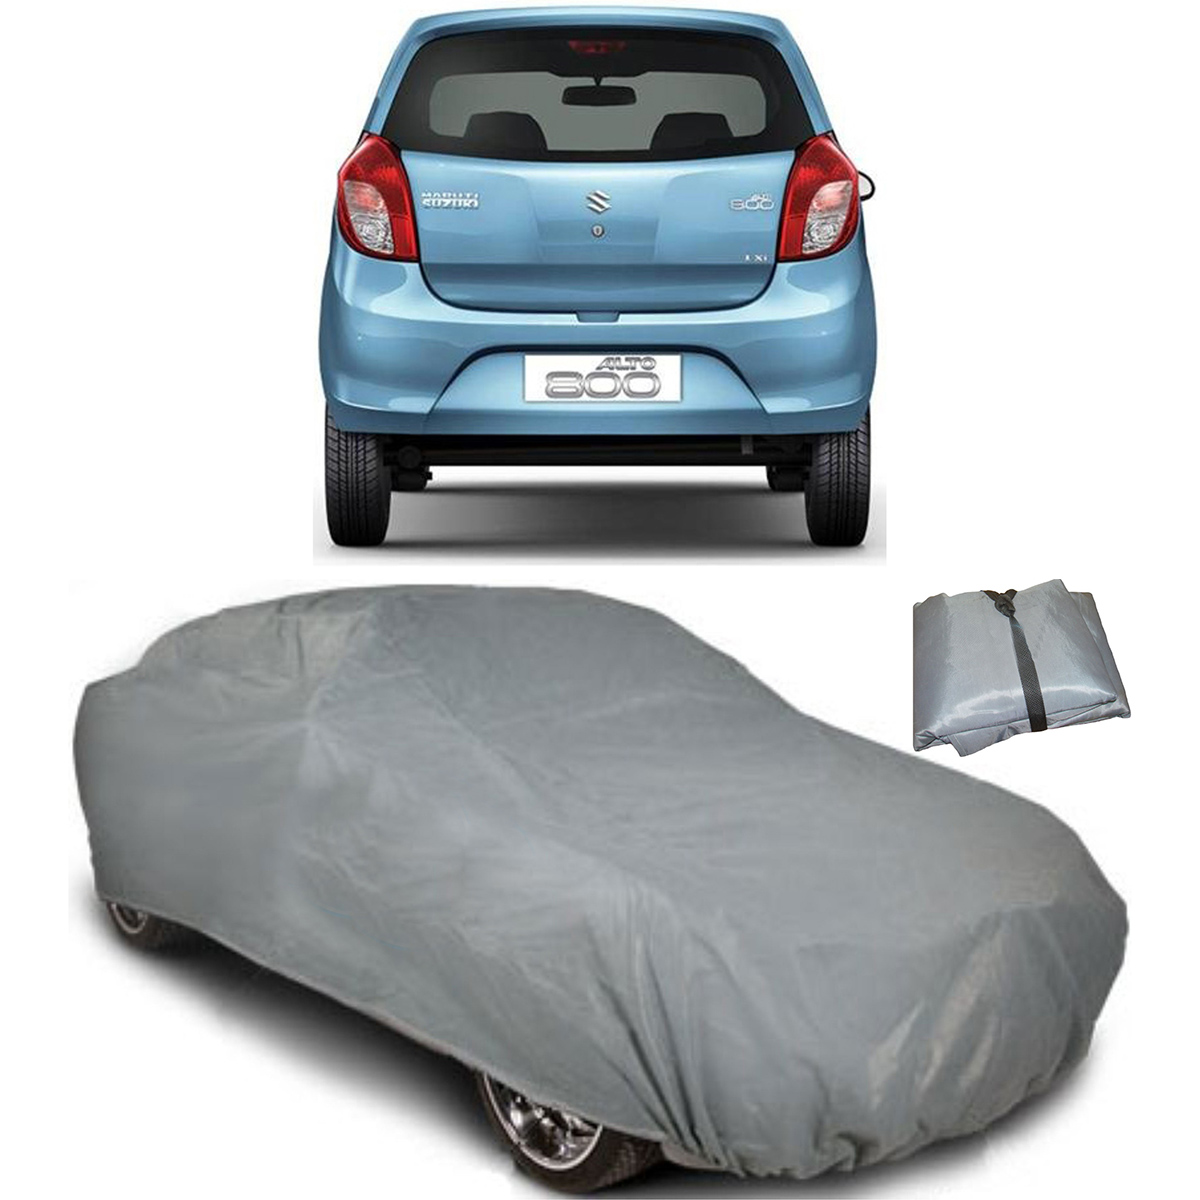 Buy digitru car body cover for maruti suzuki alto 800 dark grey online at best price in india